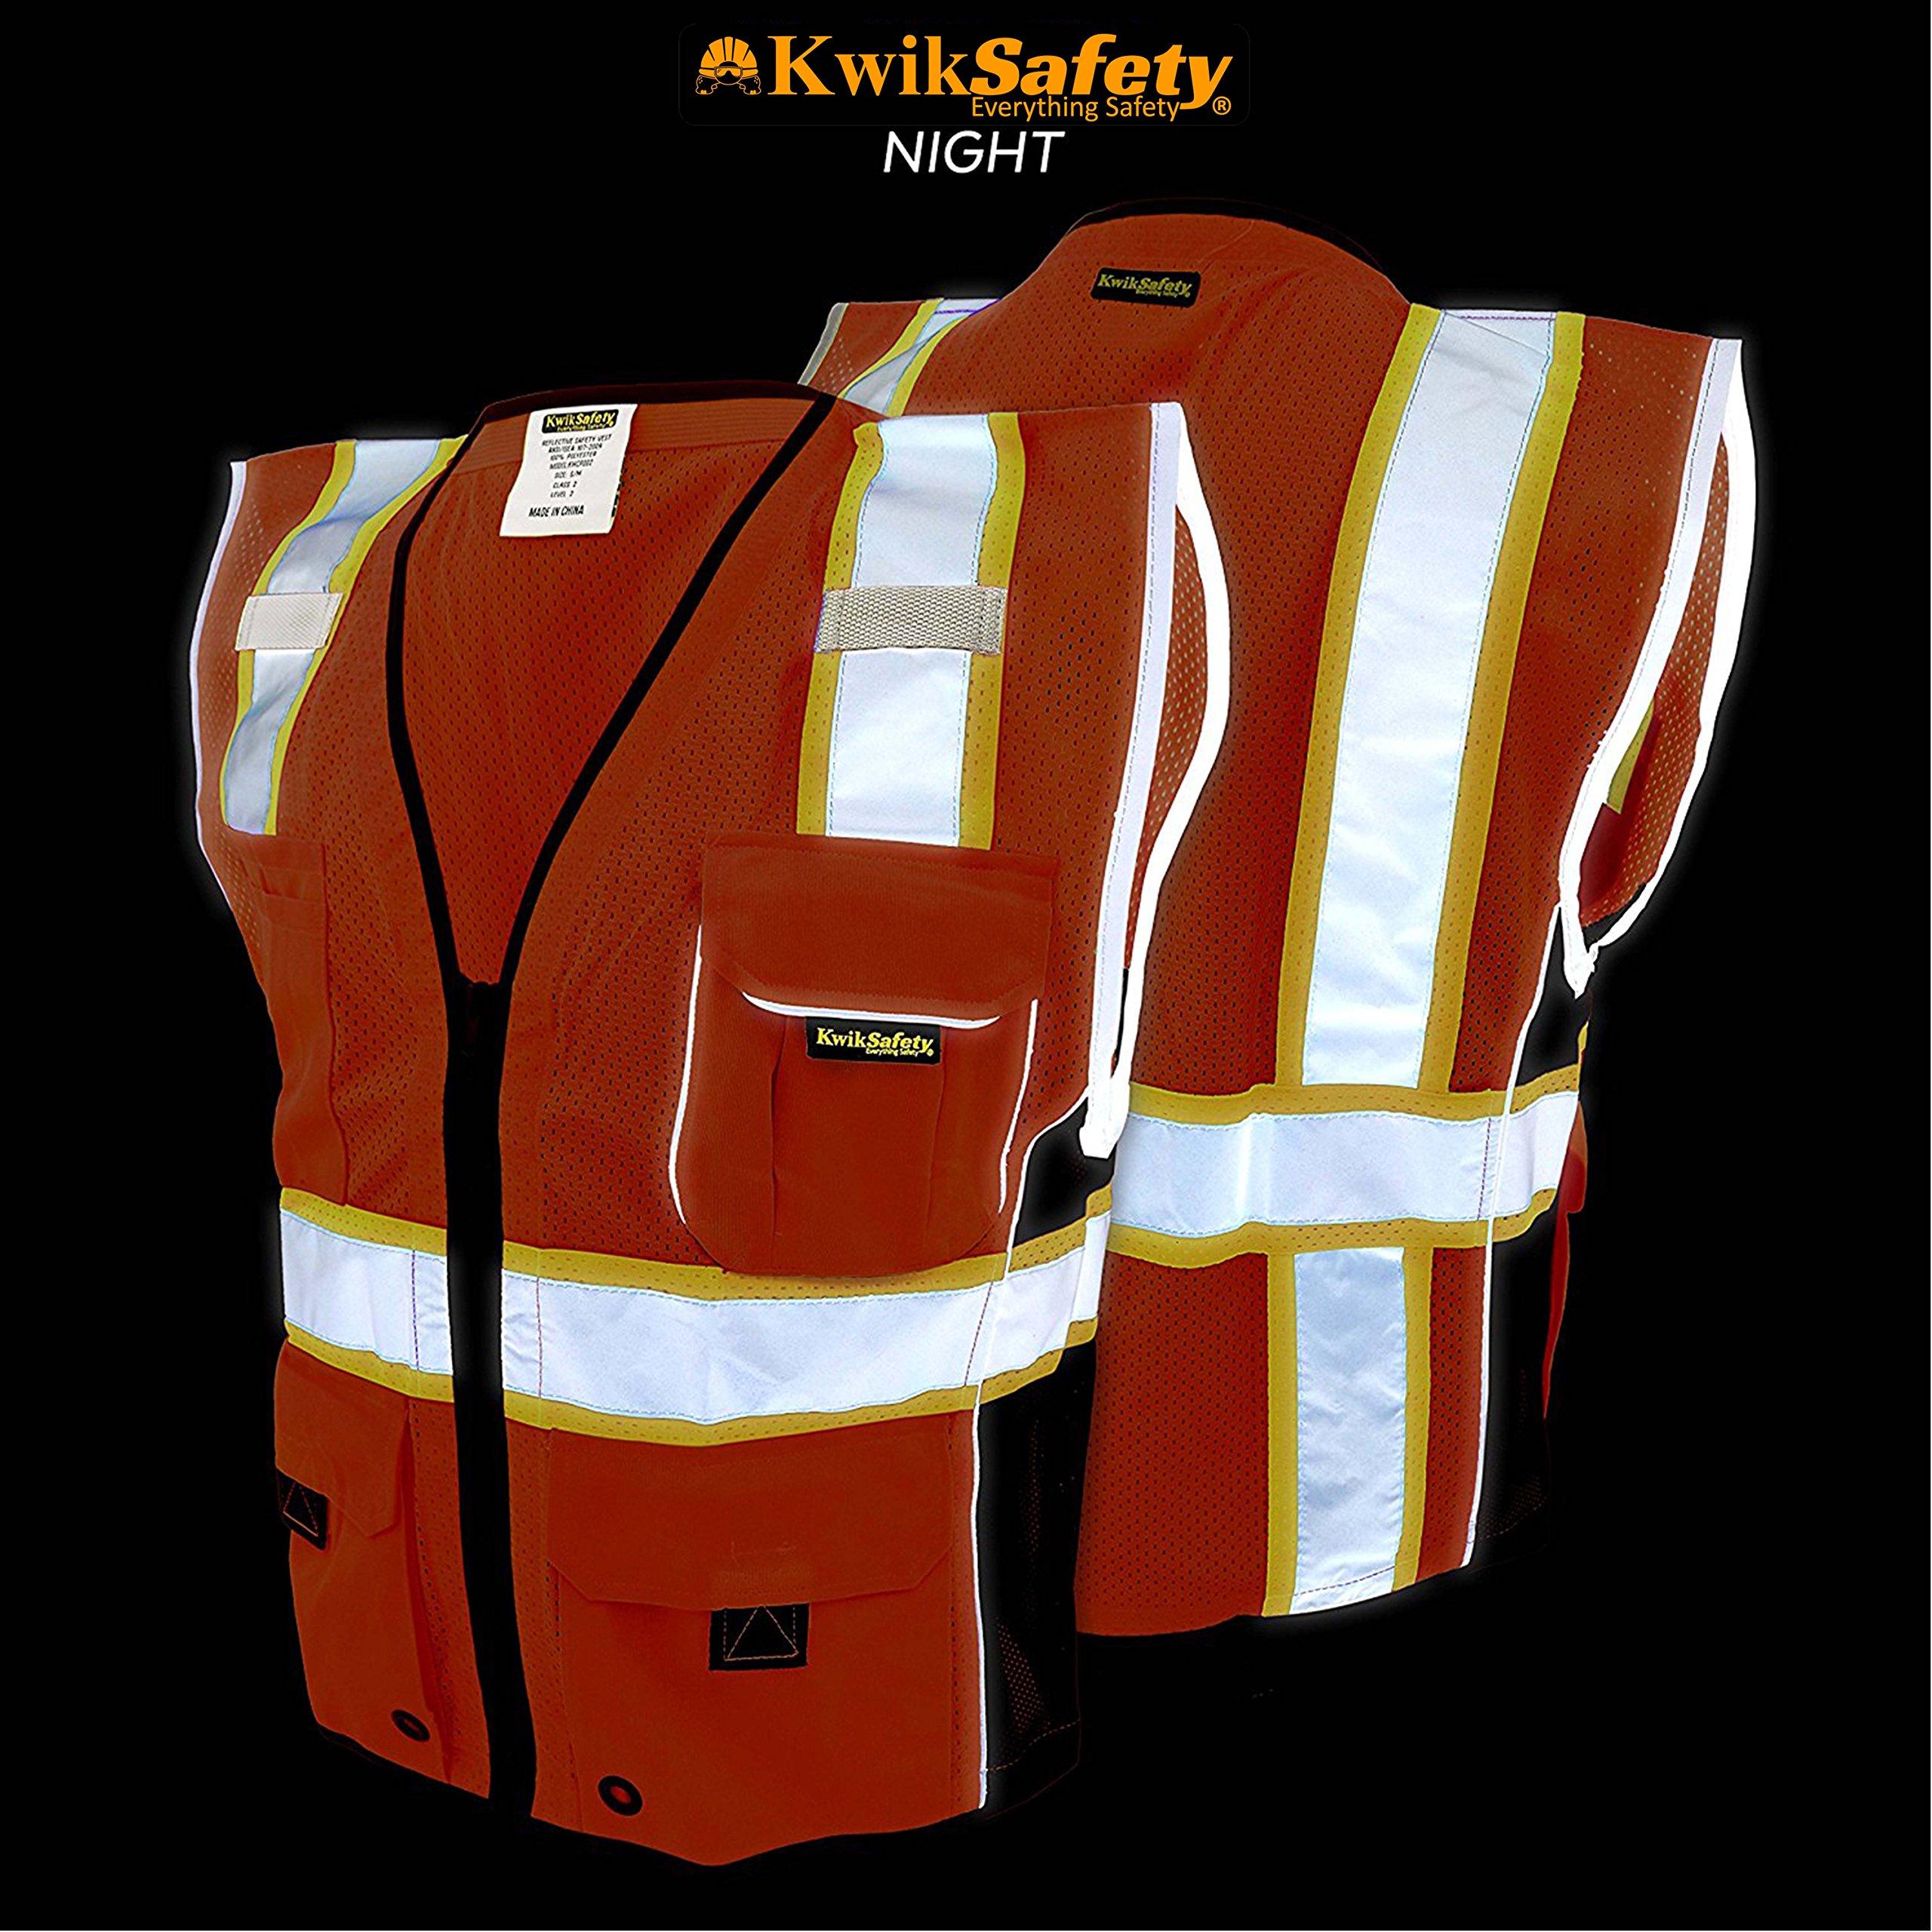 KwikSafety CLASSIC Safety Vest | Class 2 ANSI OSHA PPE | High Visibility Reflective Stripes, Heavy Duty Mesh with Pockets and Zipper | Hi-Vis Construction Work Hi-Vis Surveyor | Orange S/M by KwikSafety (Image #4)